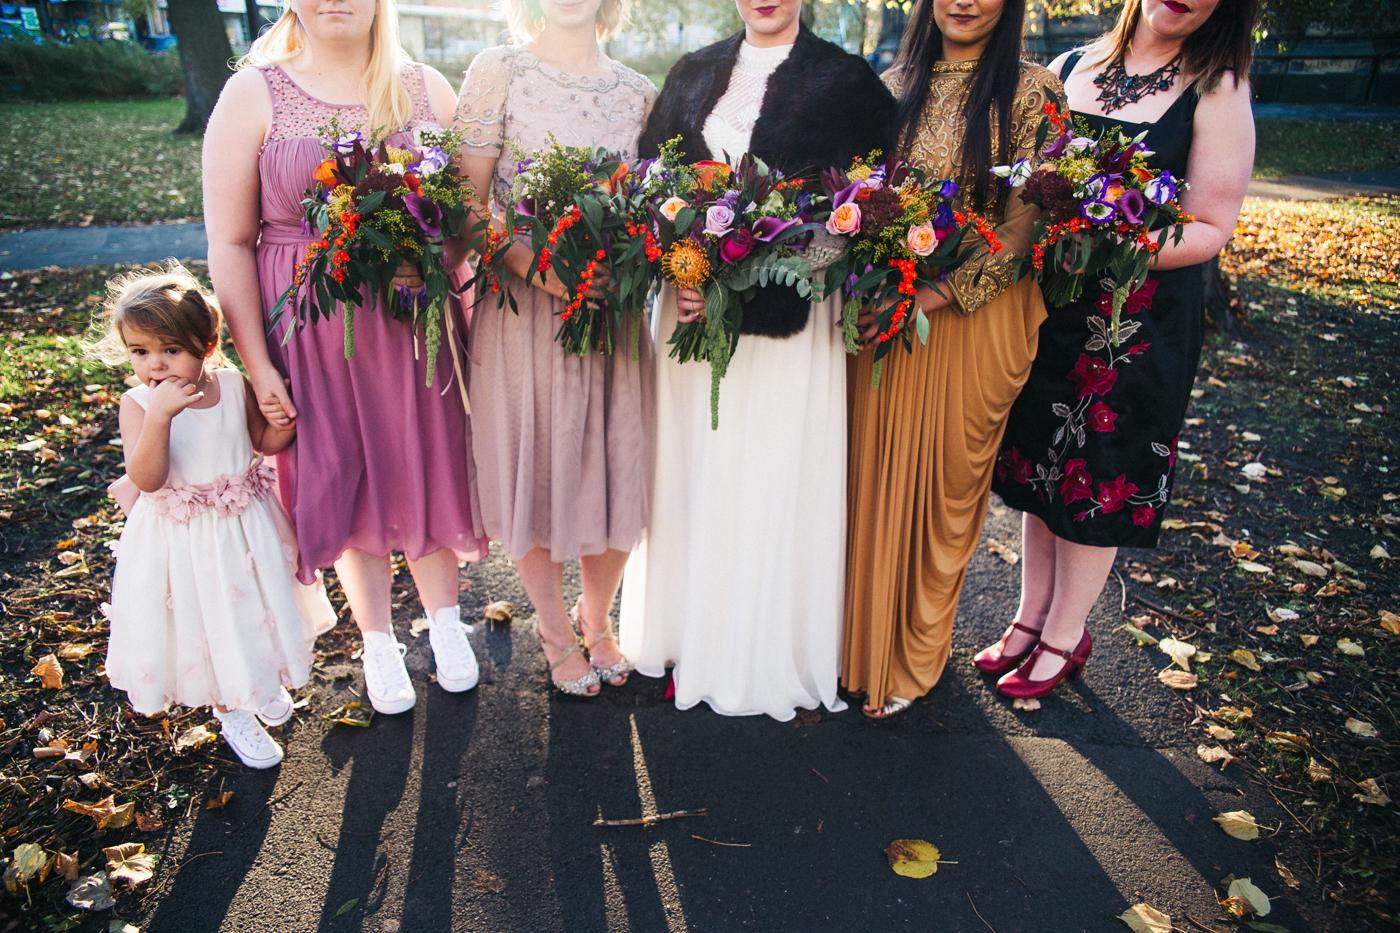 teesside-middlesbrough-north-east-wedding-photographer-creative-wedding-venues-0040.jpg